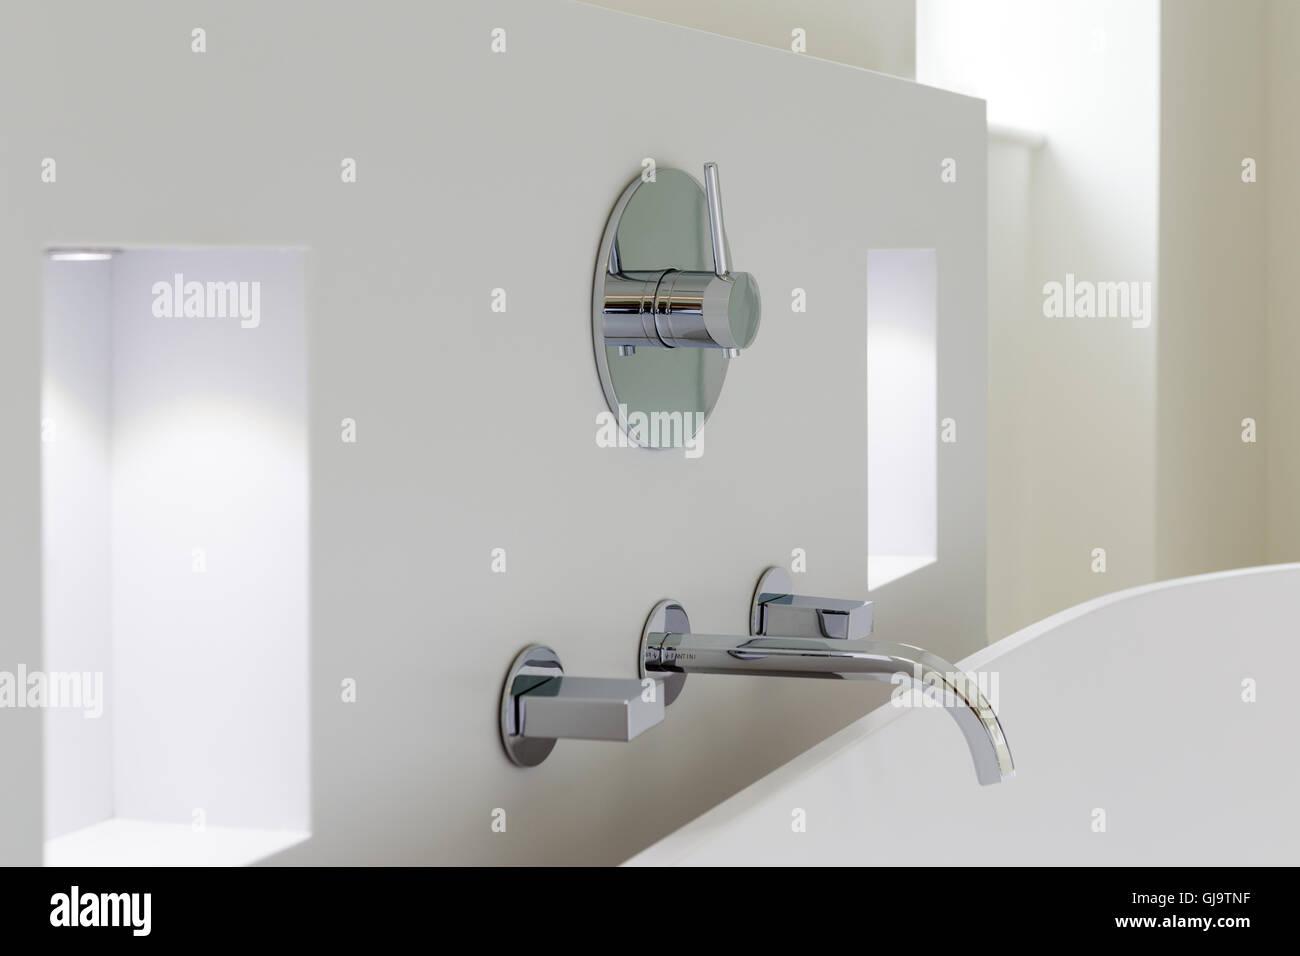 Modern stylish bathroom taps - Stock Image